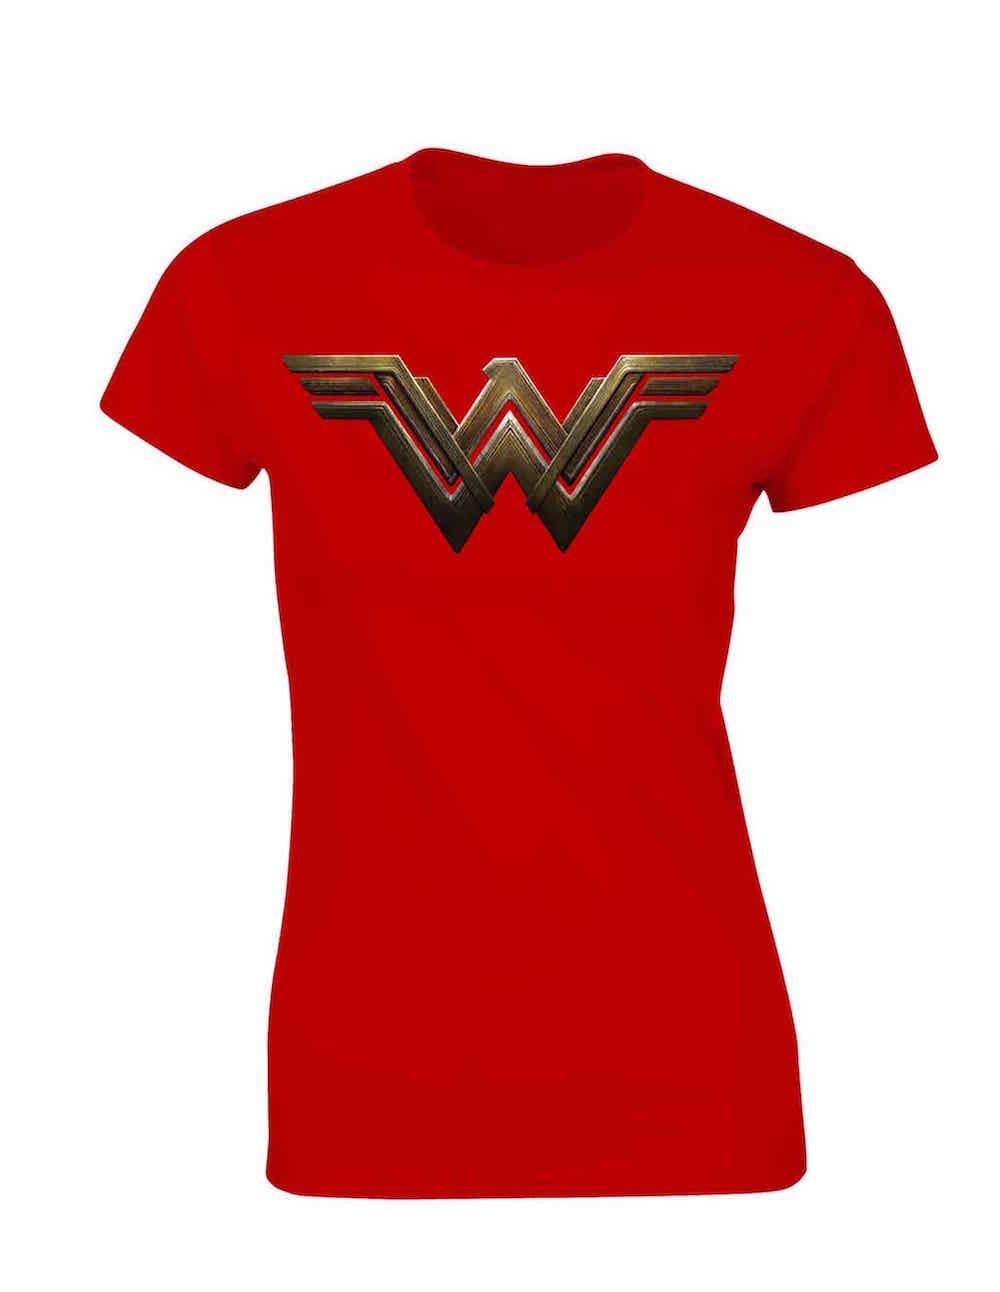 LOGO WONDER WOMAN CAMISETA ROJA CHICA T-S BATMAN VS SUPERMAN DC